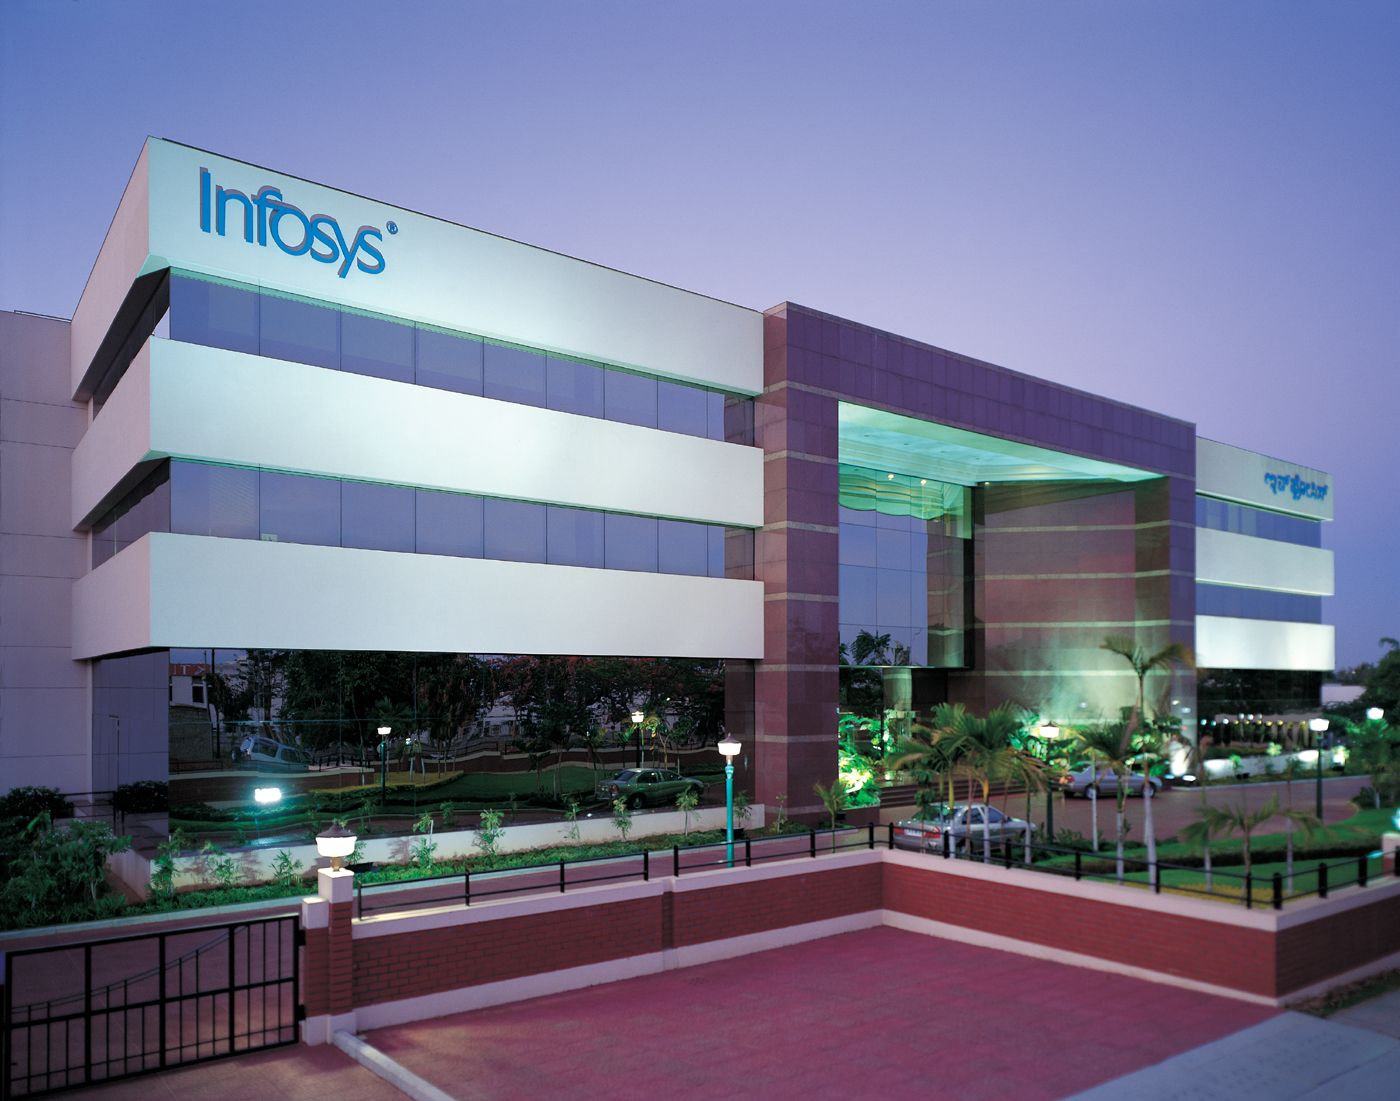 Infosys Bangalore Firmengebäude / Corporate Block